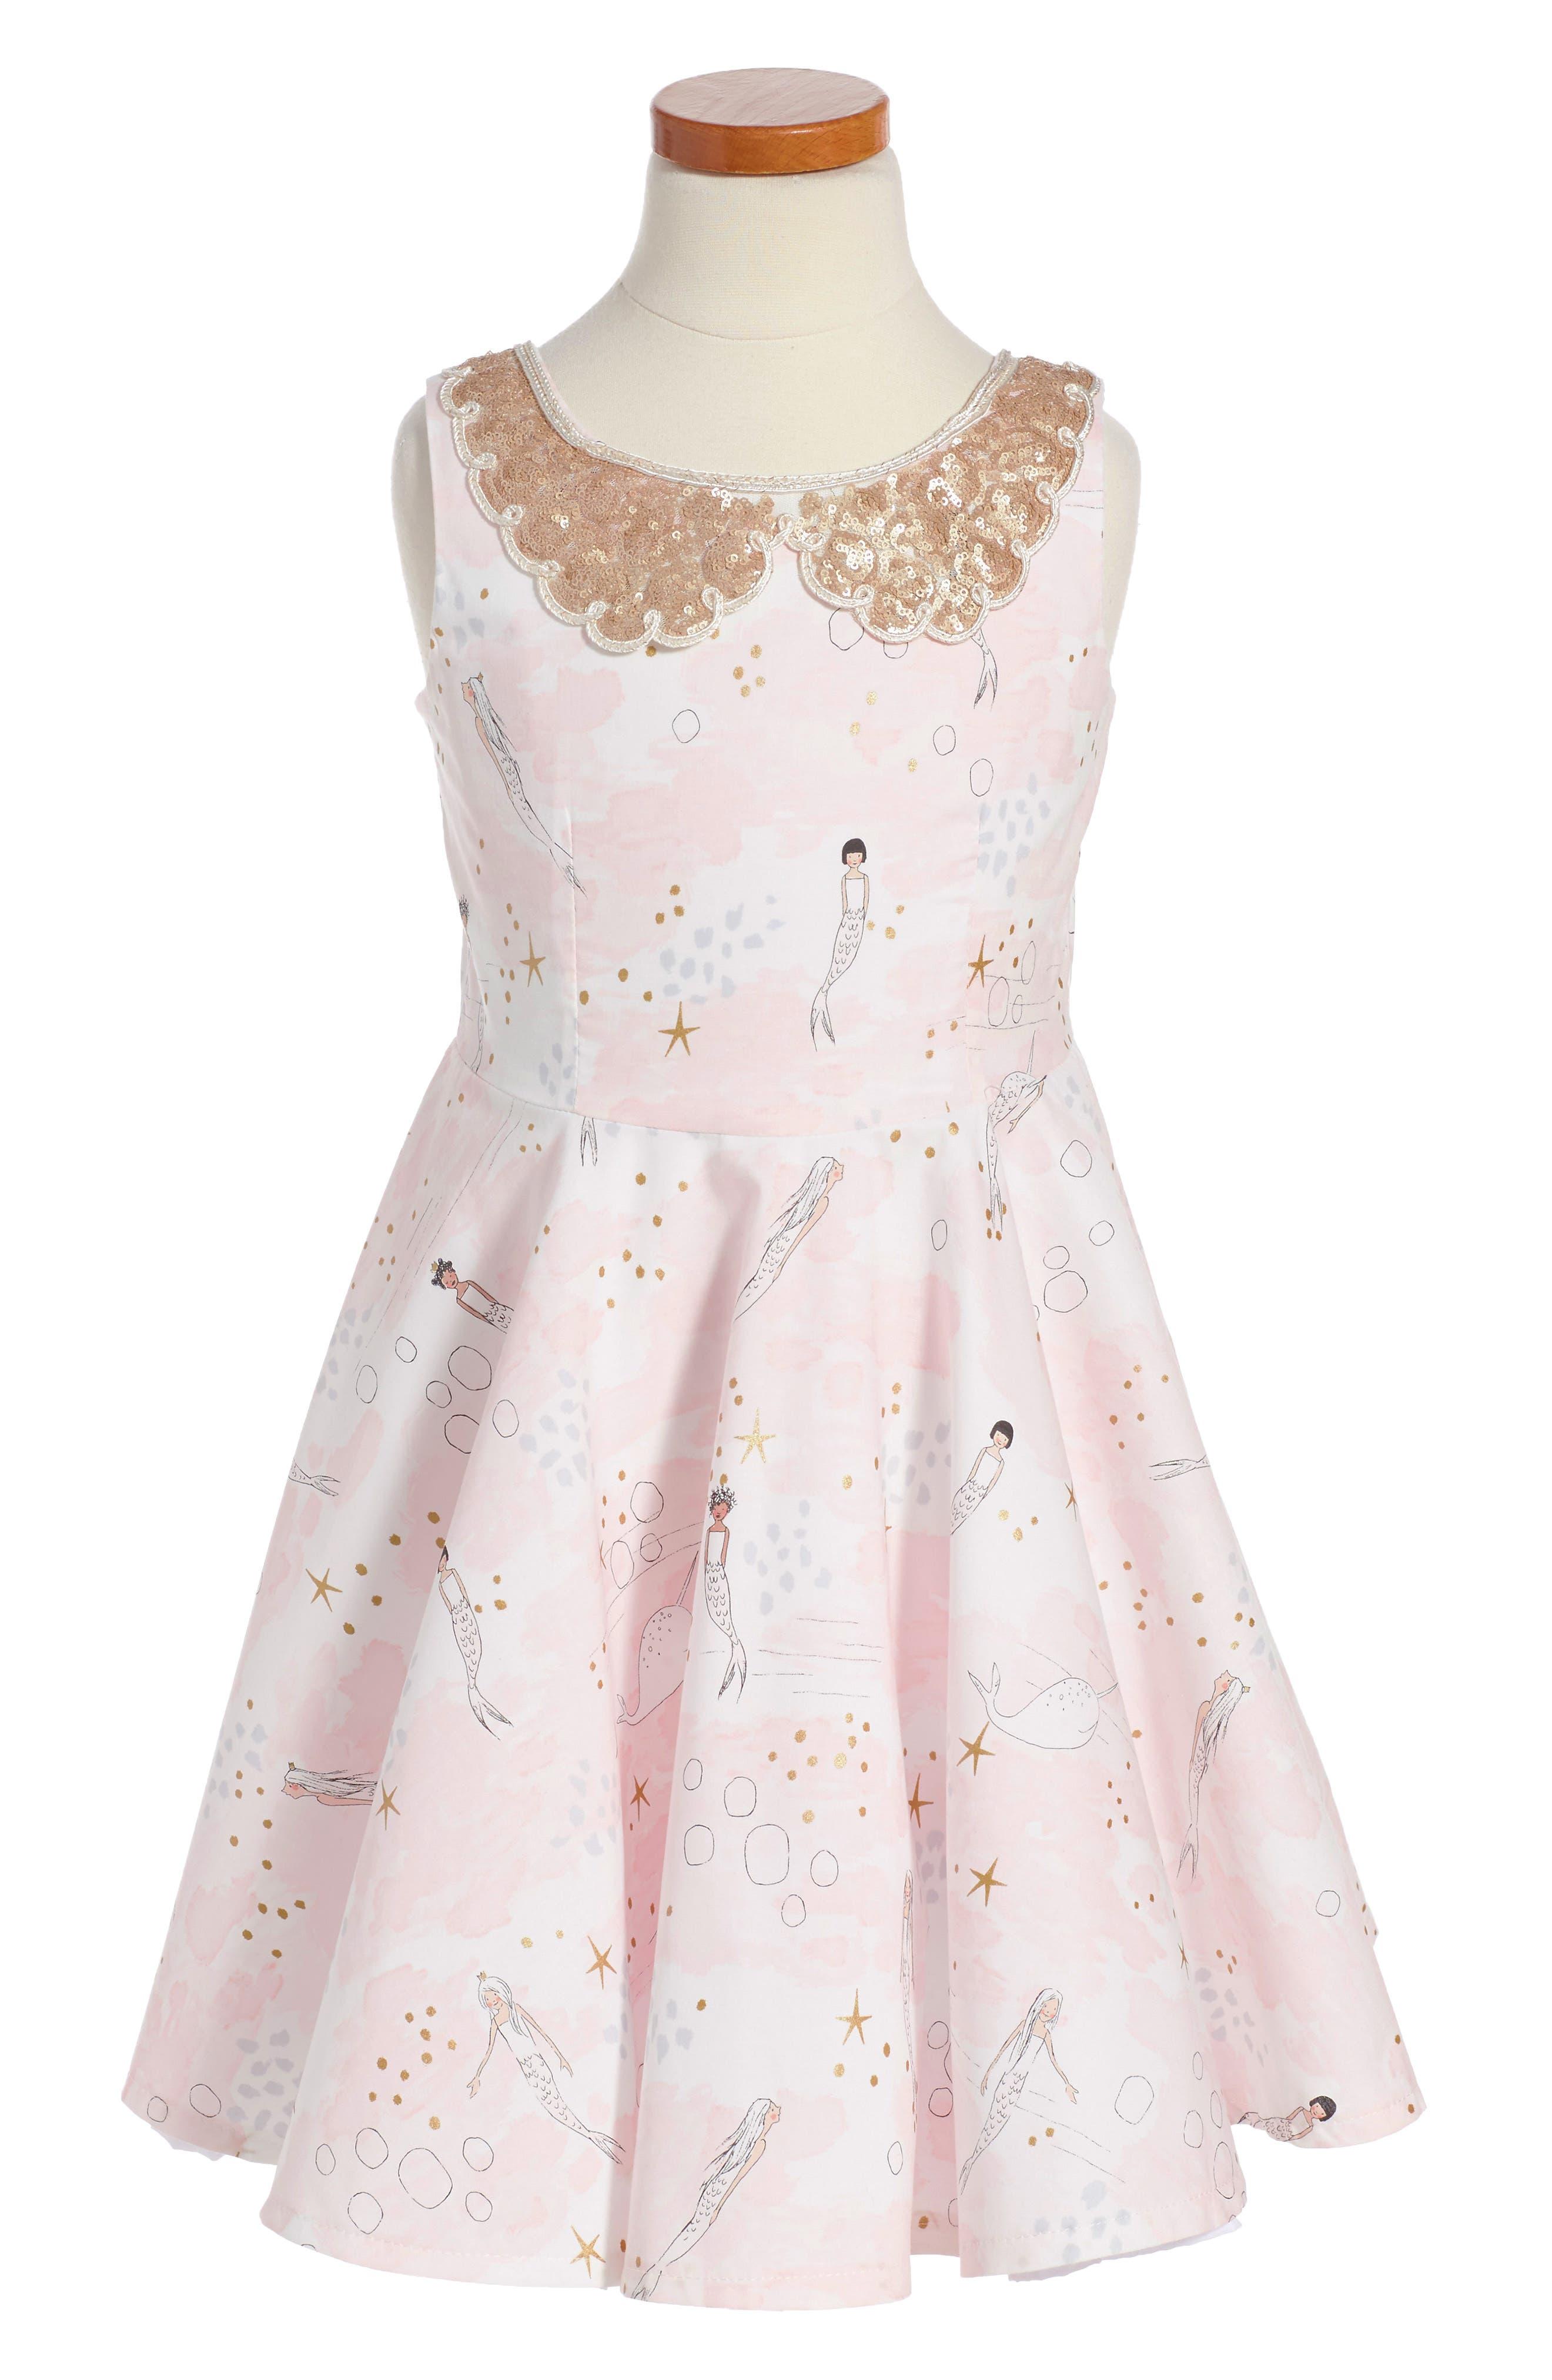 Fiveloaves Twofish The Little Mermaid Dress (Toddler Girls, Little Girls & Big Girls)